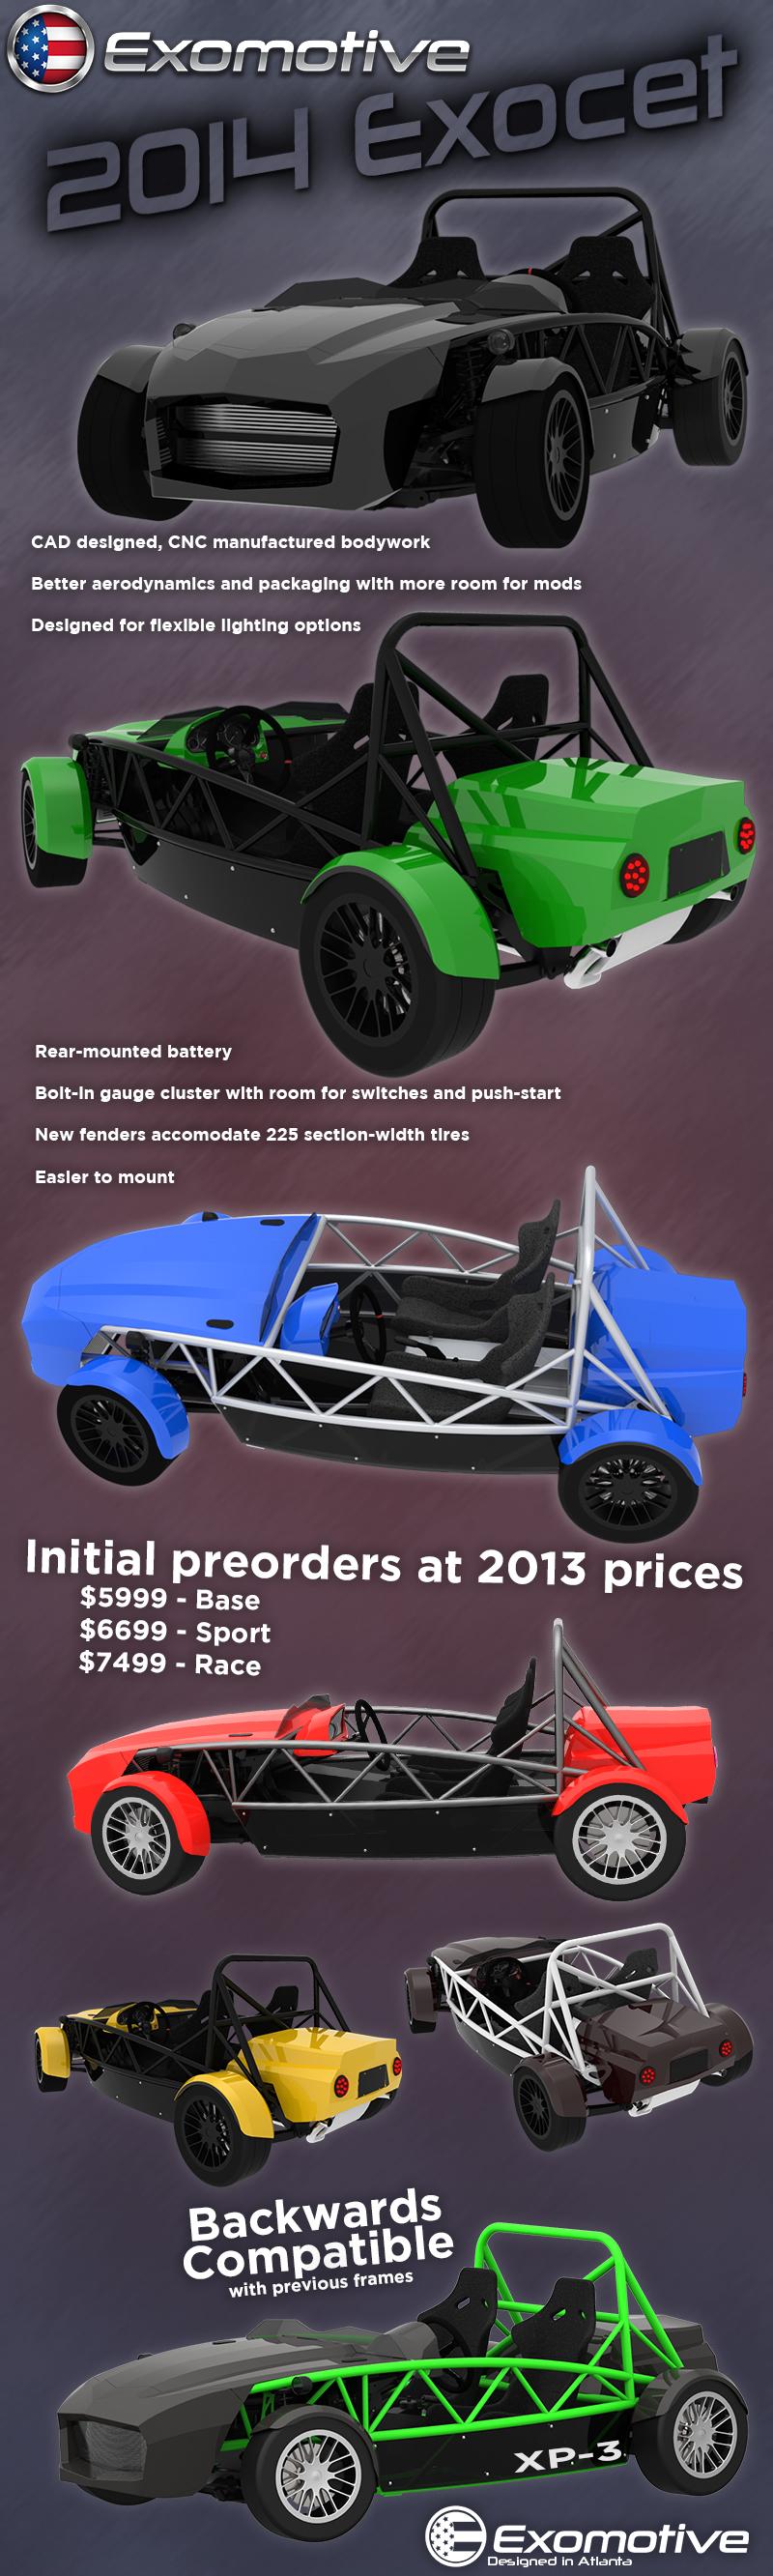 The all new 2014 Exocet bodywork from Exomotive